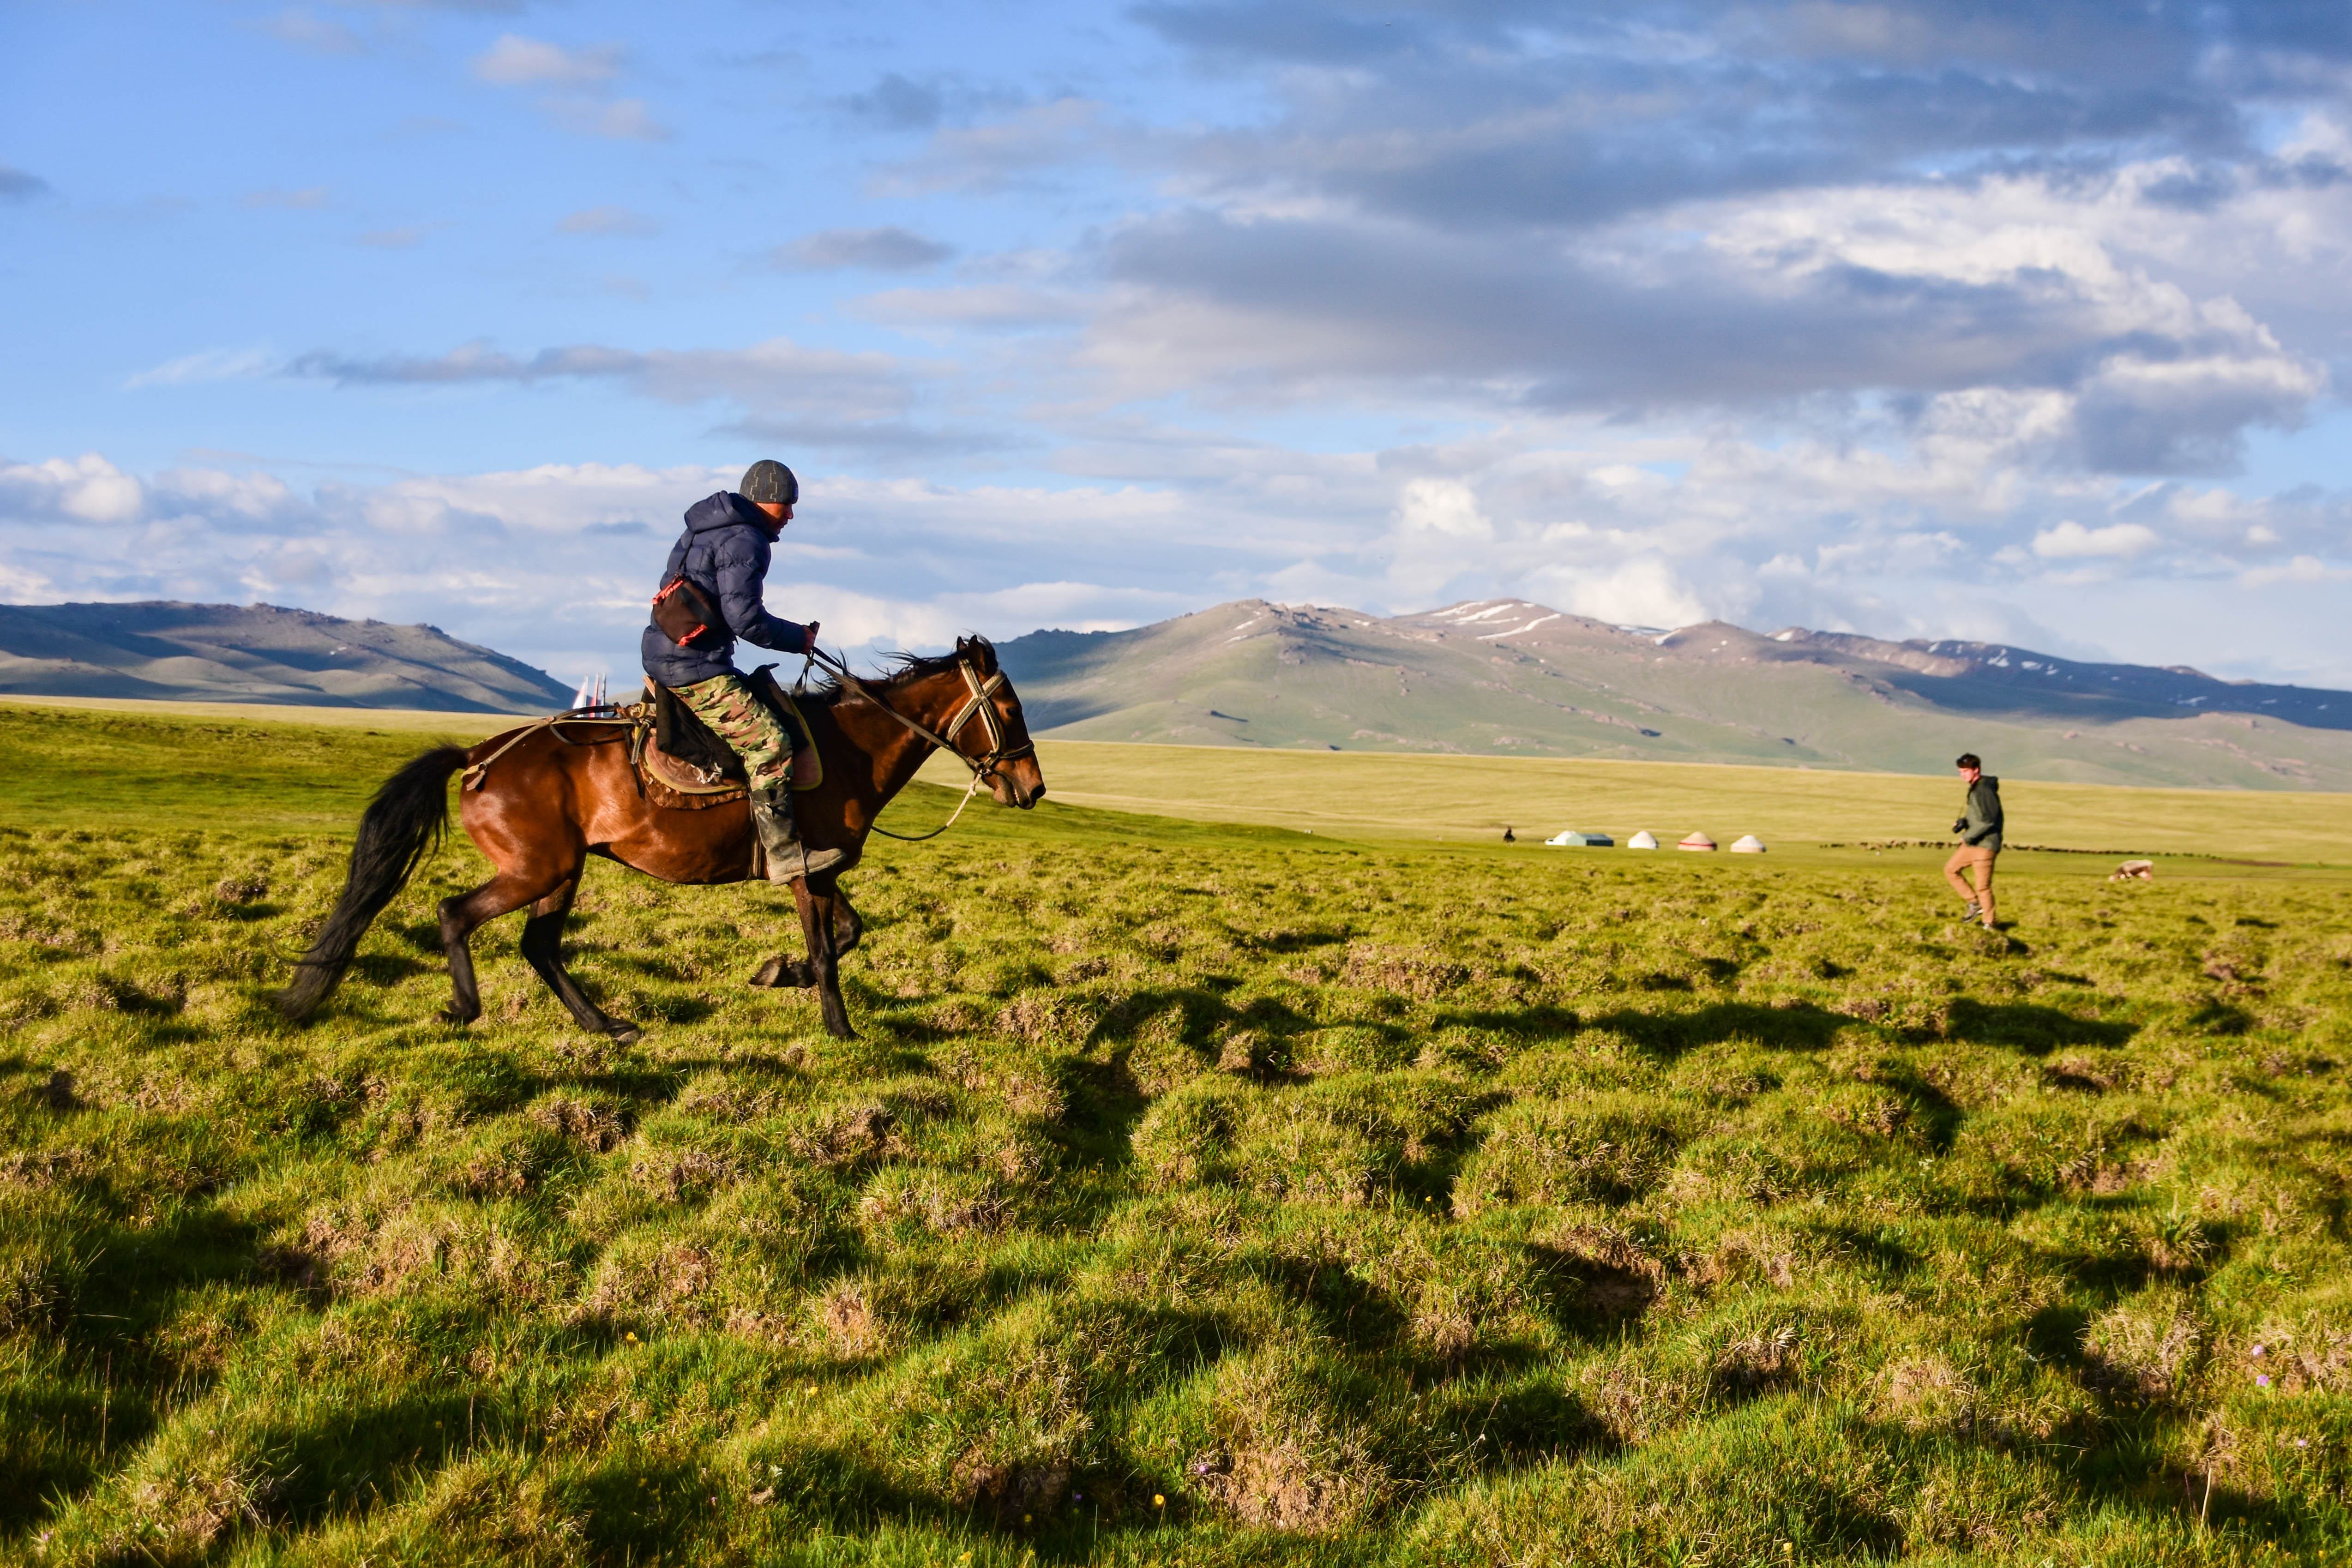 CoverMore_Lisa_Owen_Kyrgyzstan_Song Kul_Horse Shepherd